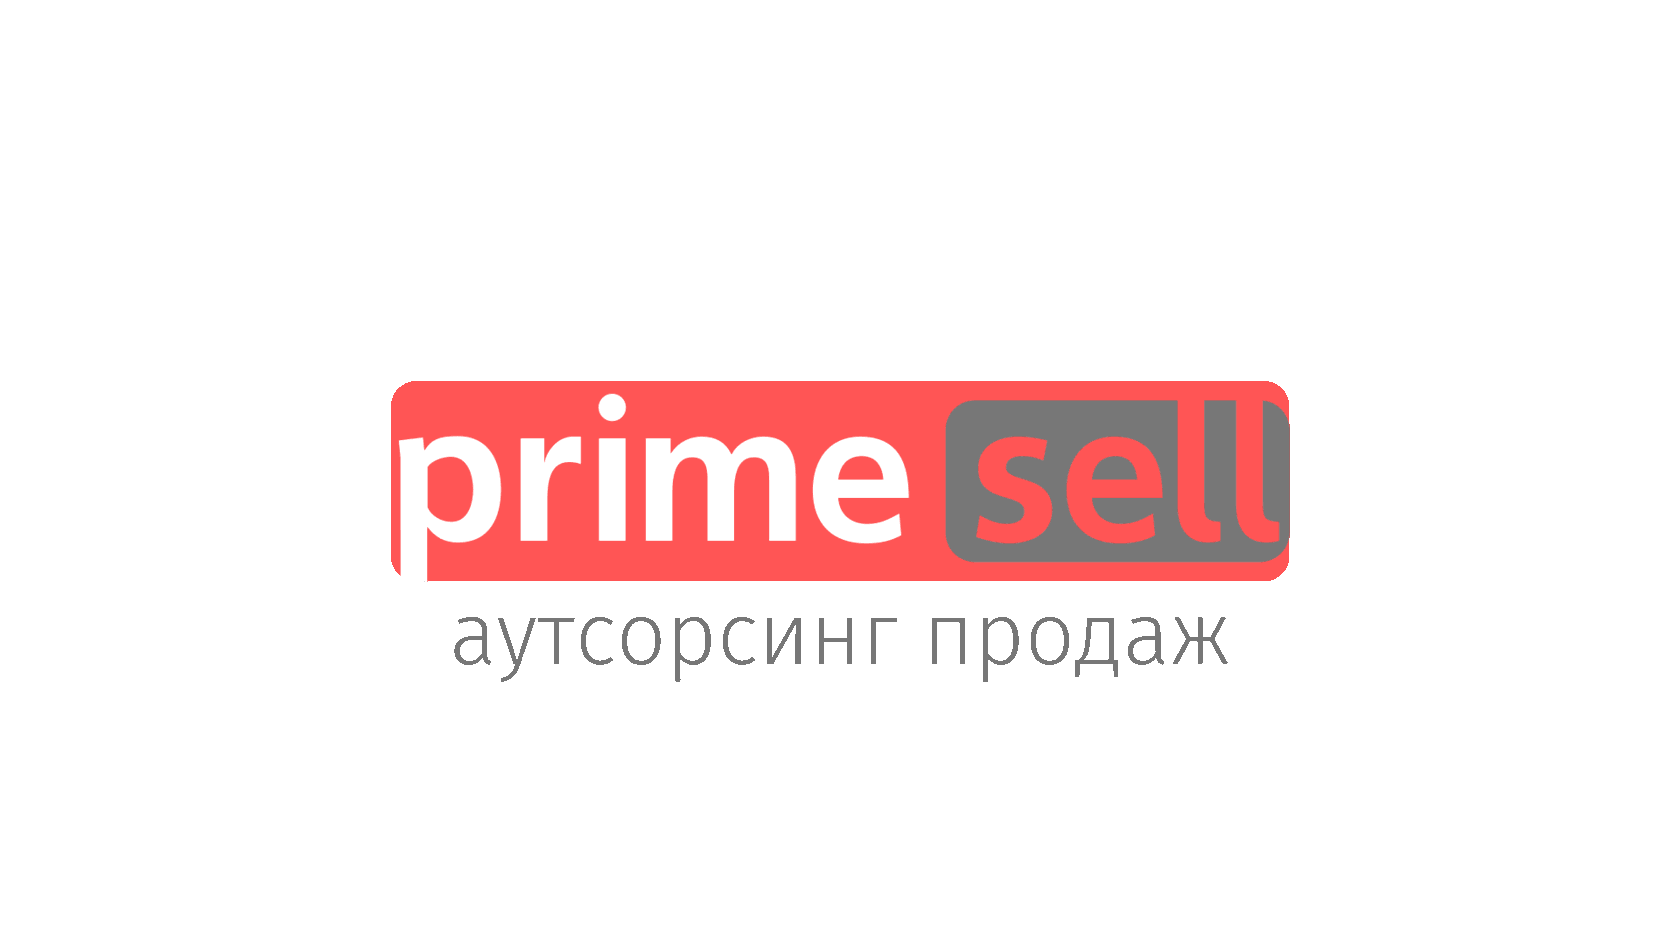 Primesell